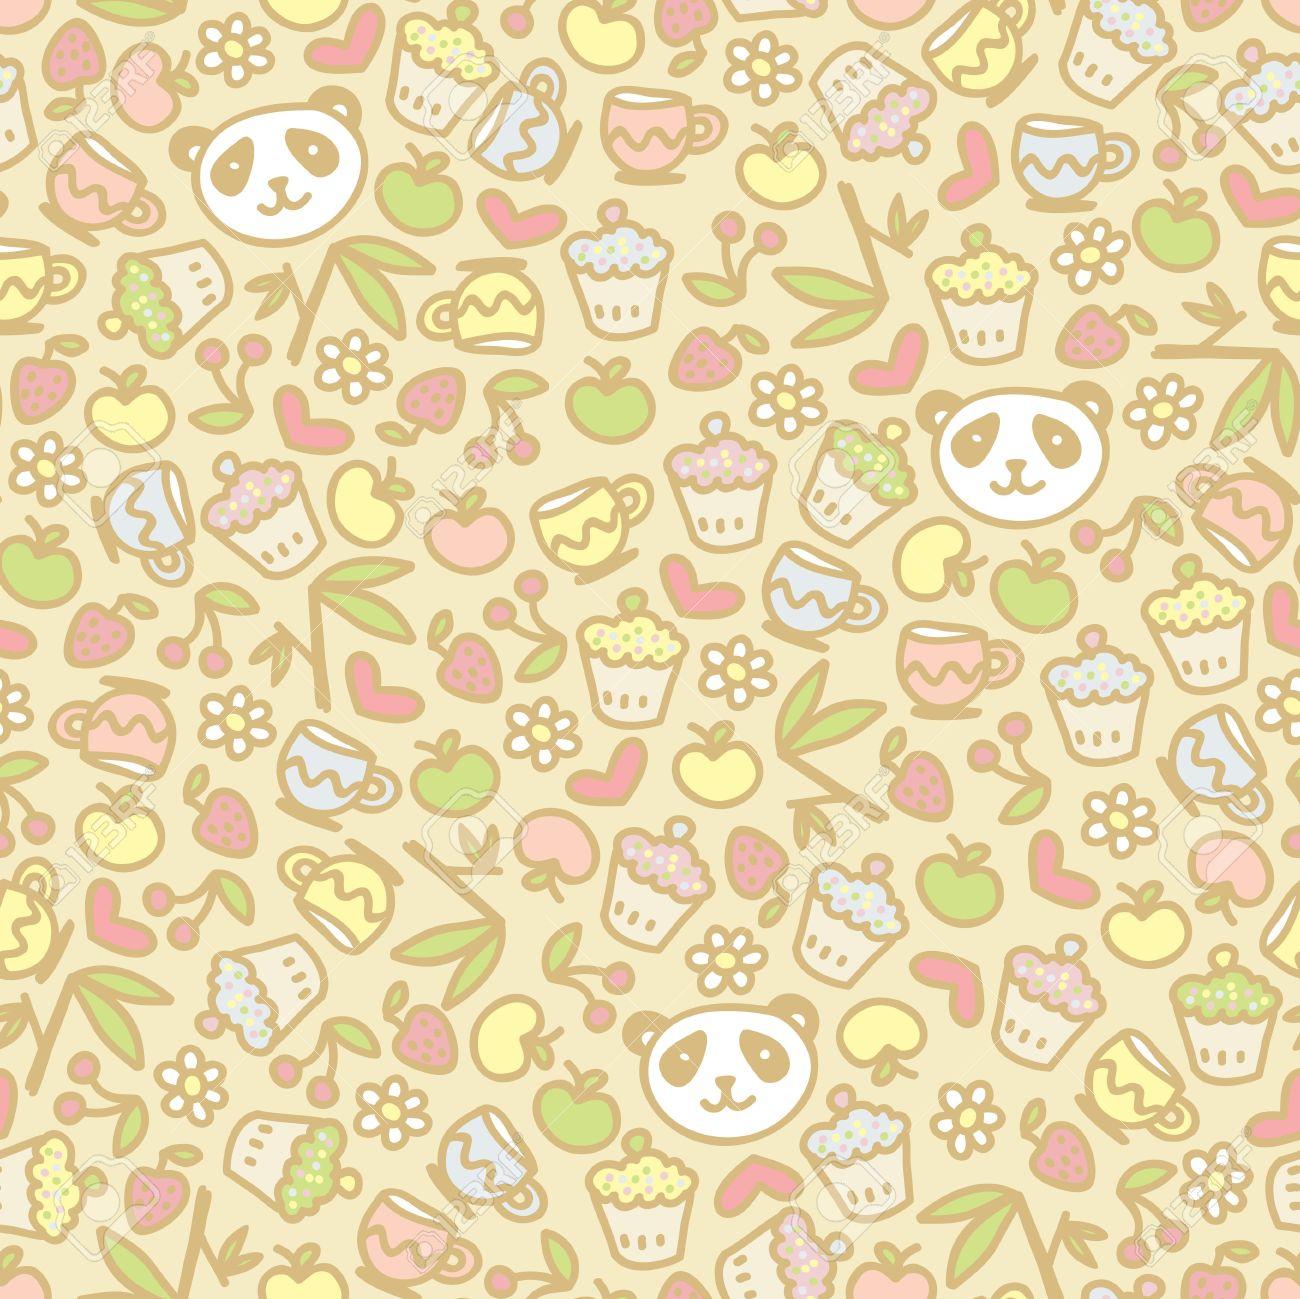 Cute panda seamless pattern, vector doodle illustration. Stock Vector - 11747523